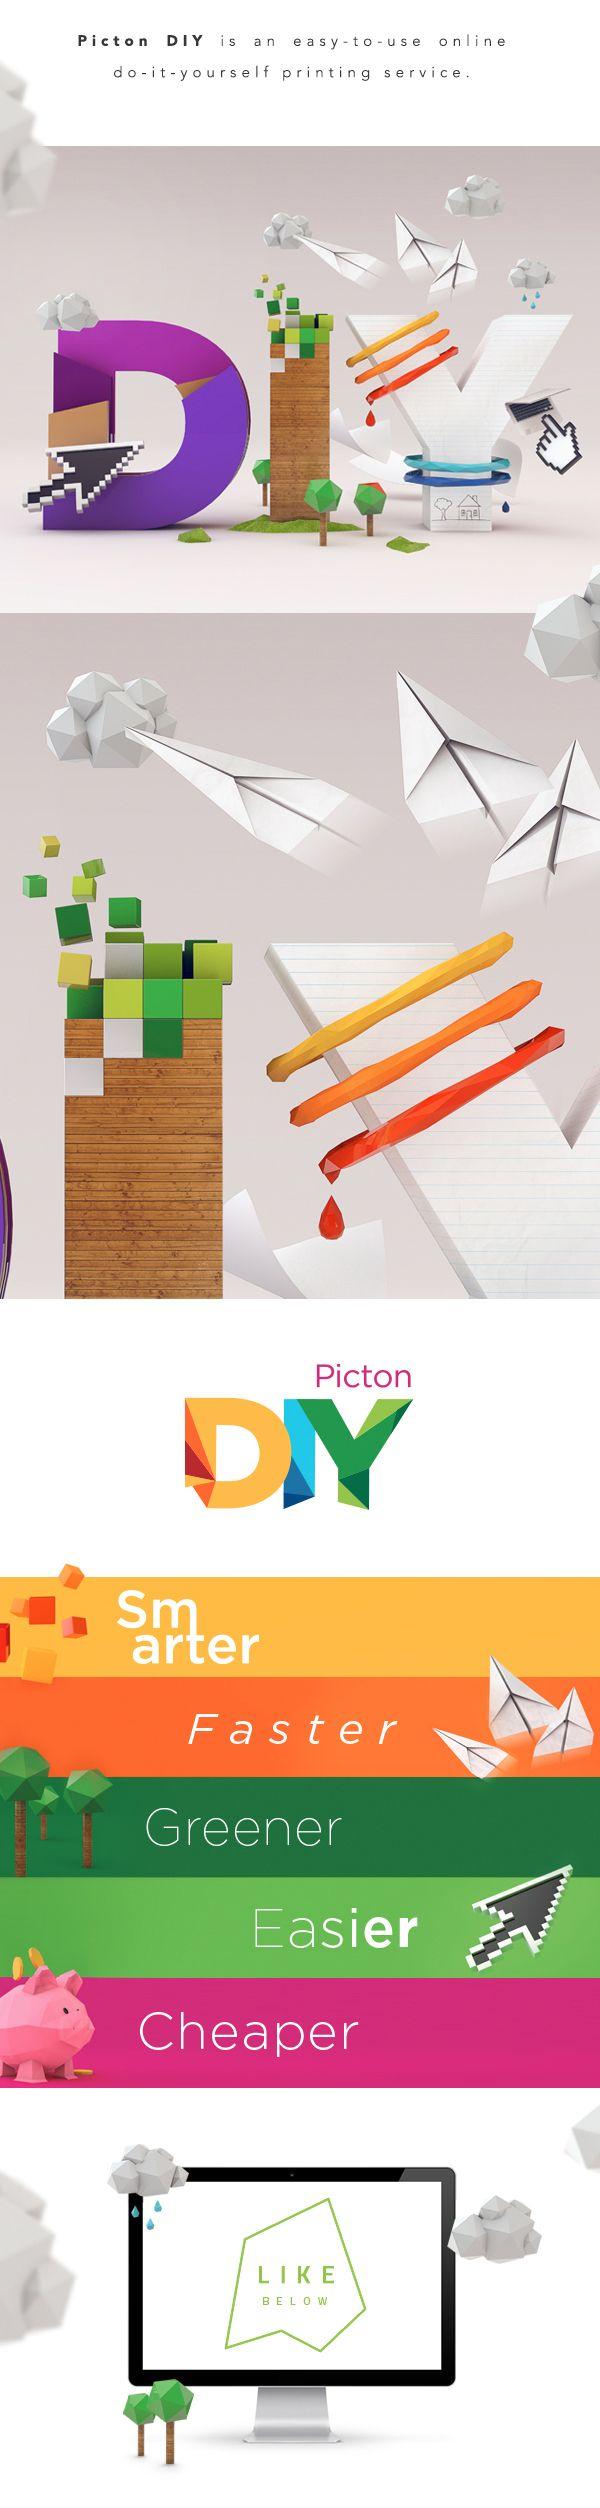 Picton Rebrand by Harley Spick, via Behance